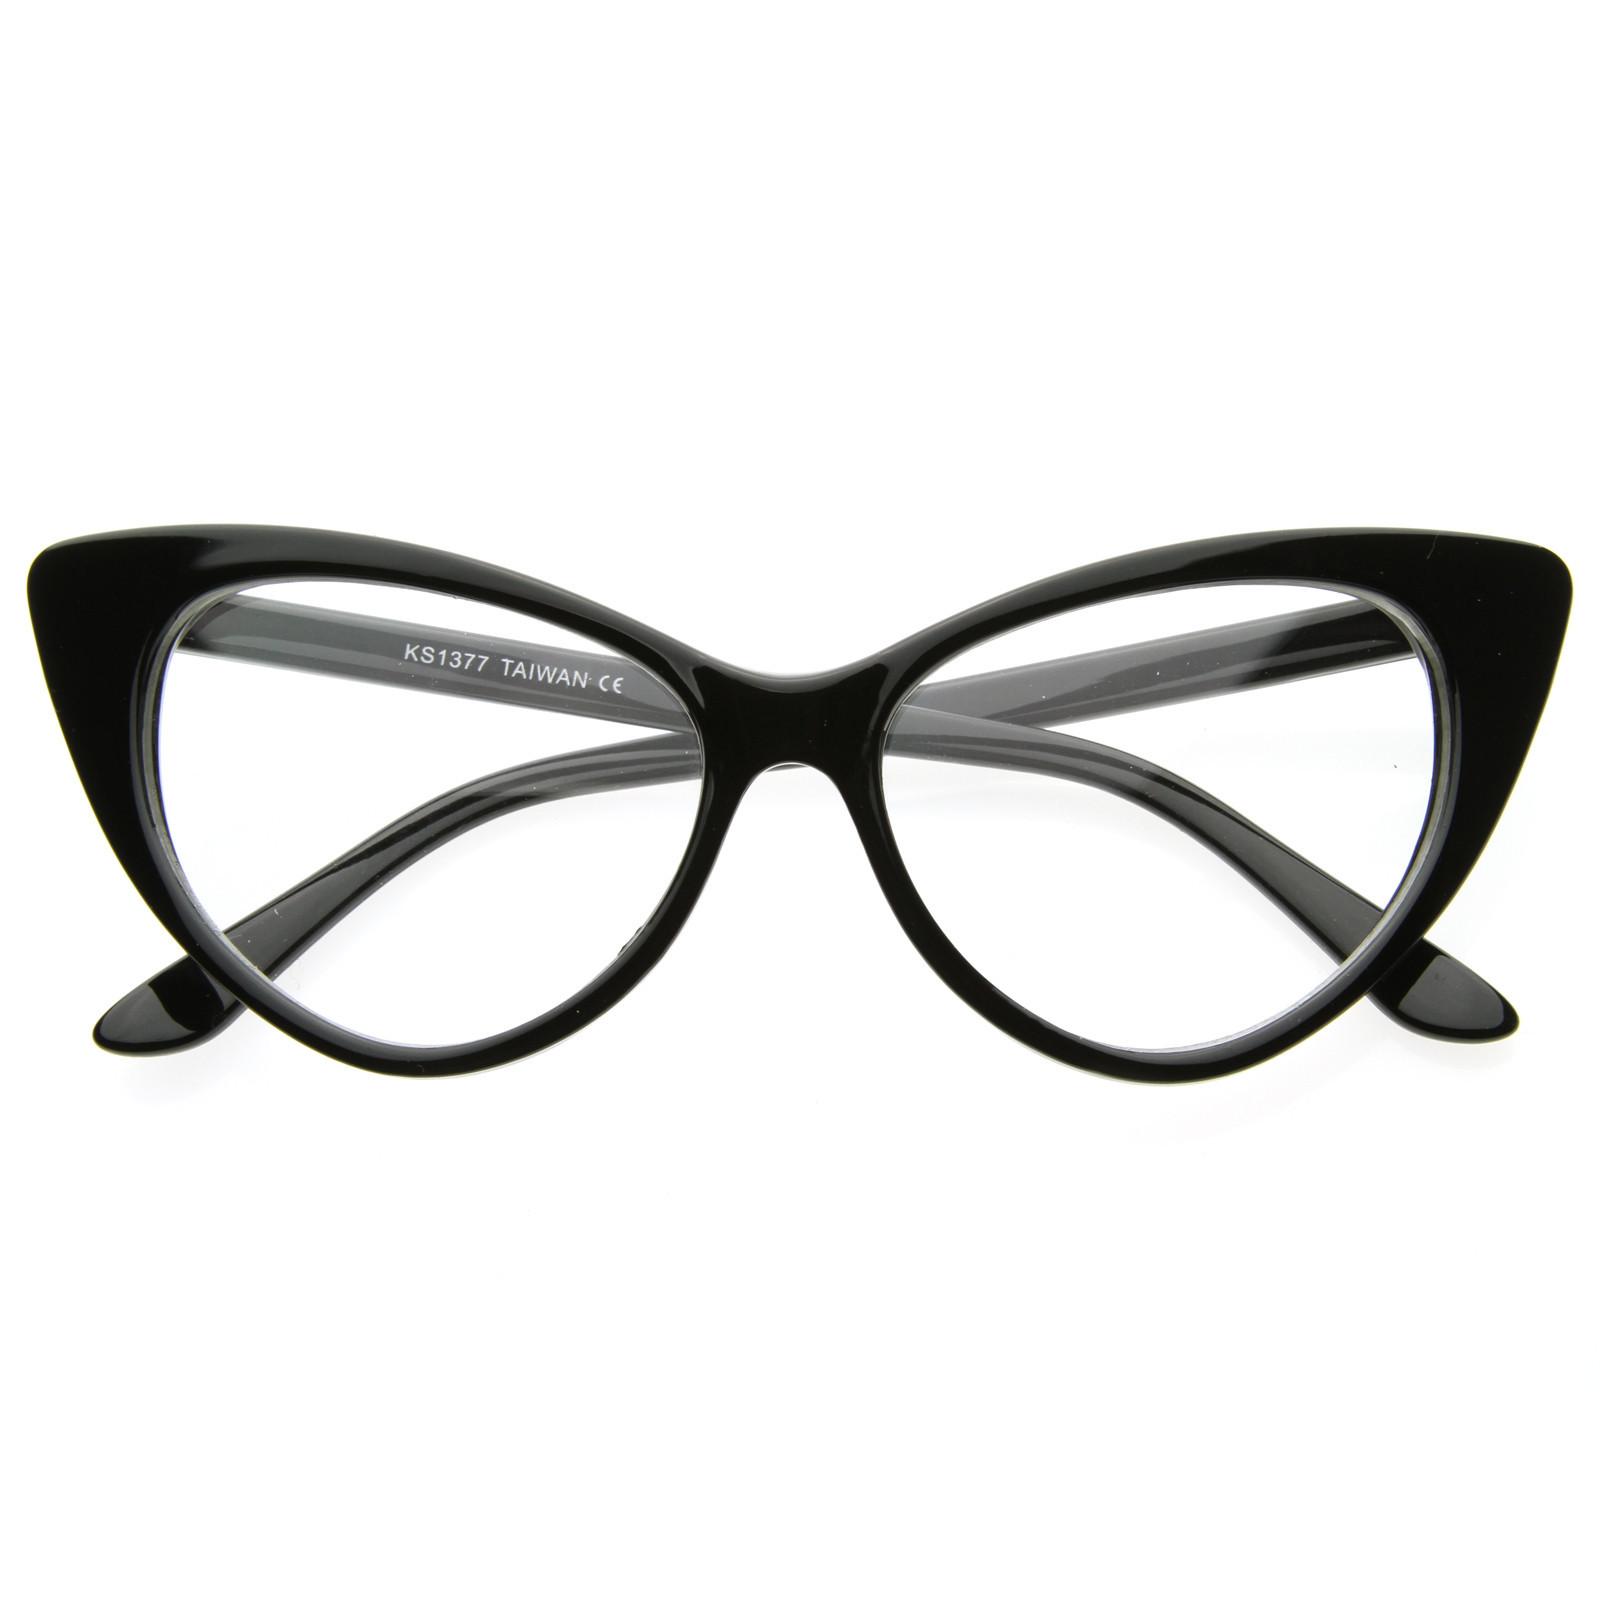 Eyeglasses cat eye sunglasses clipart big